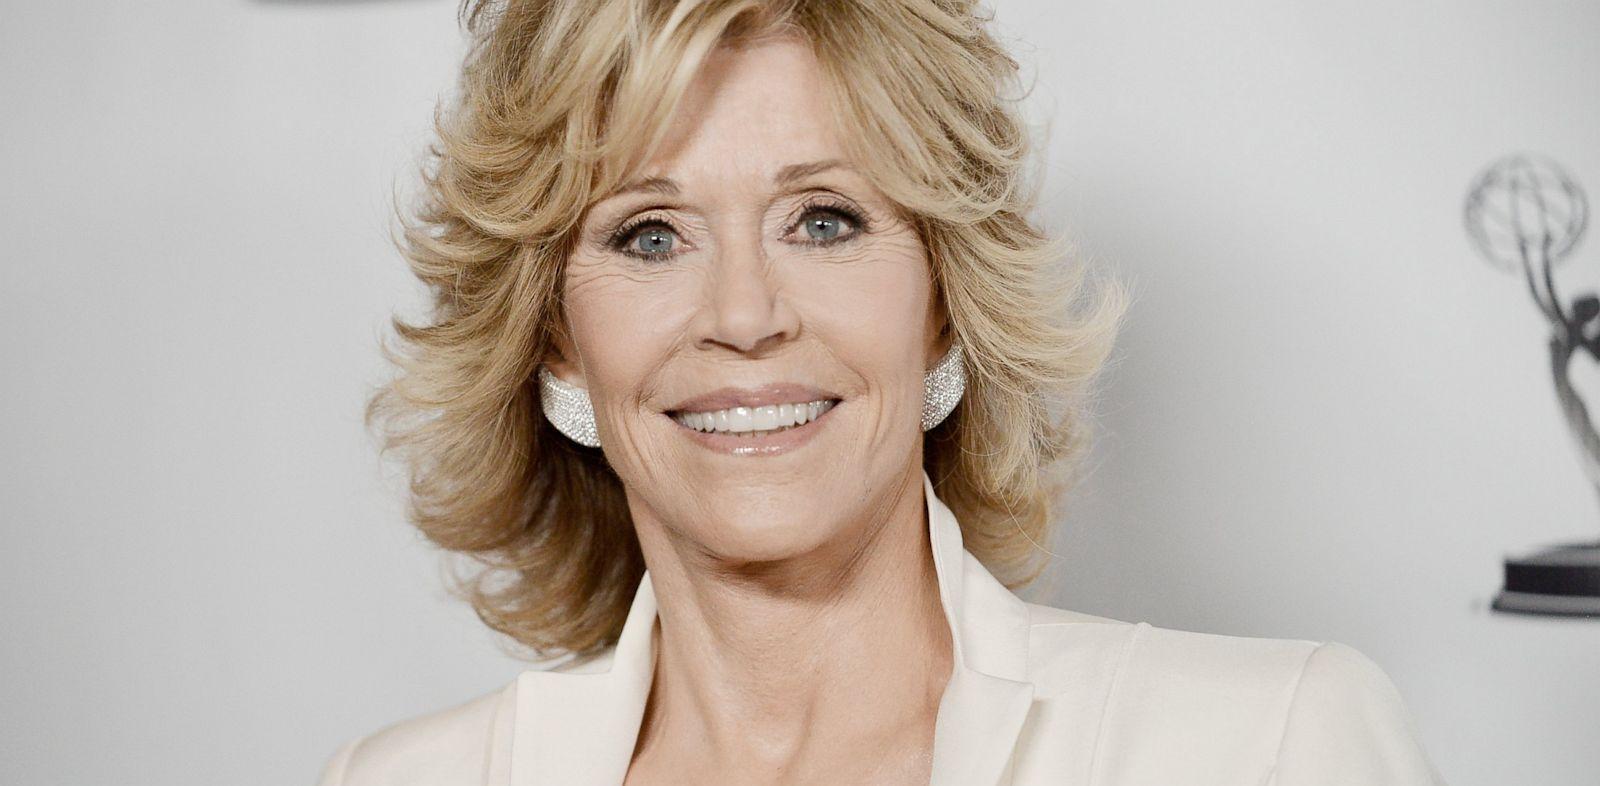 PHOTO: Jane Fonda